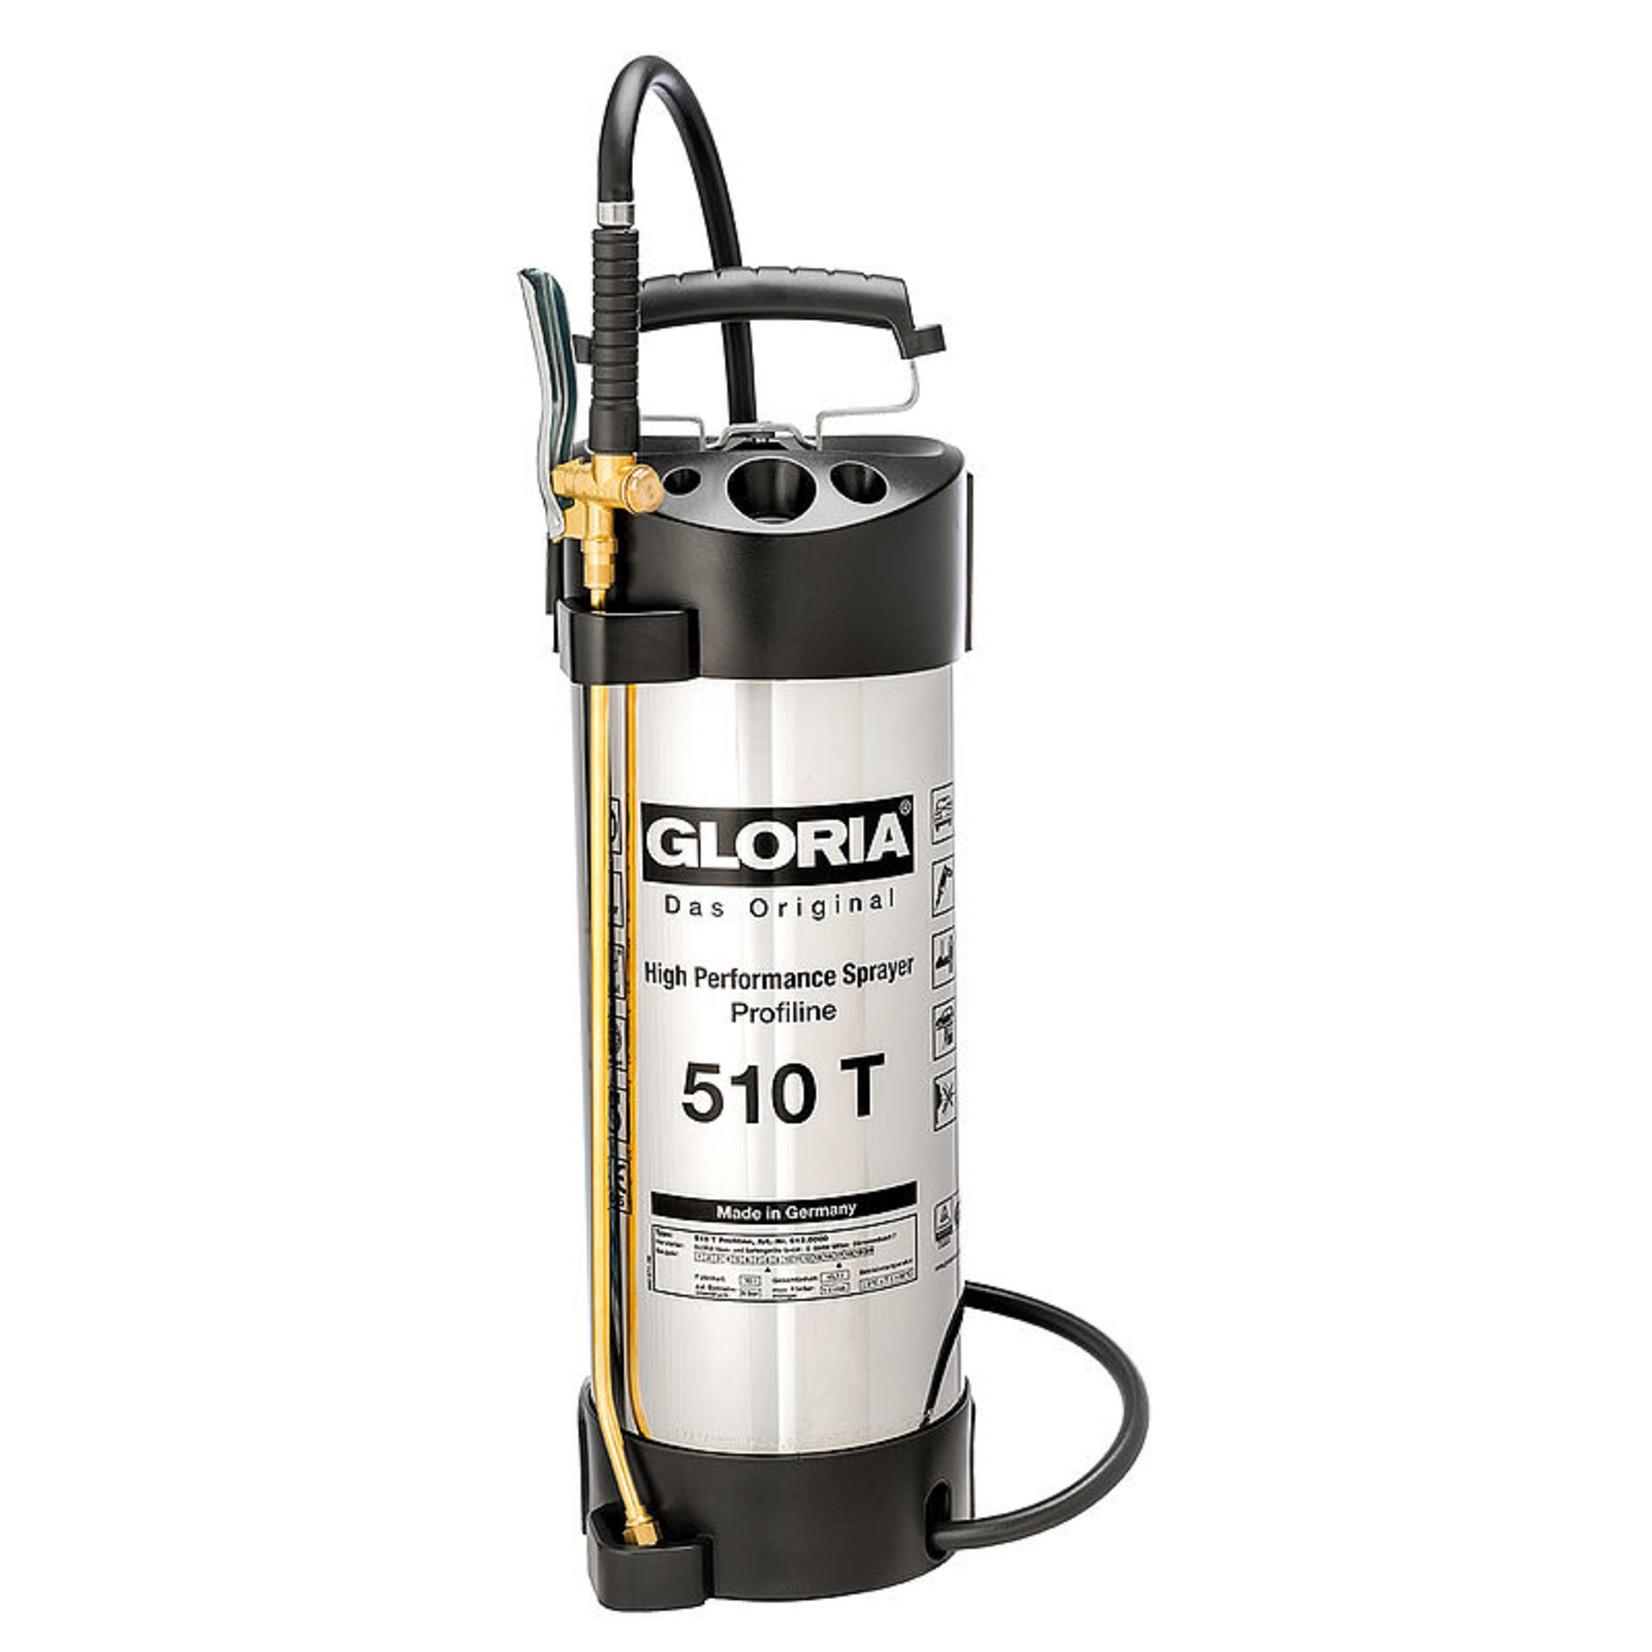 Gloria Industrie Hogedrukspuit RVS 510T Profiline (10 liter)